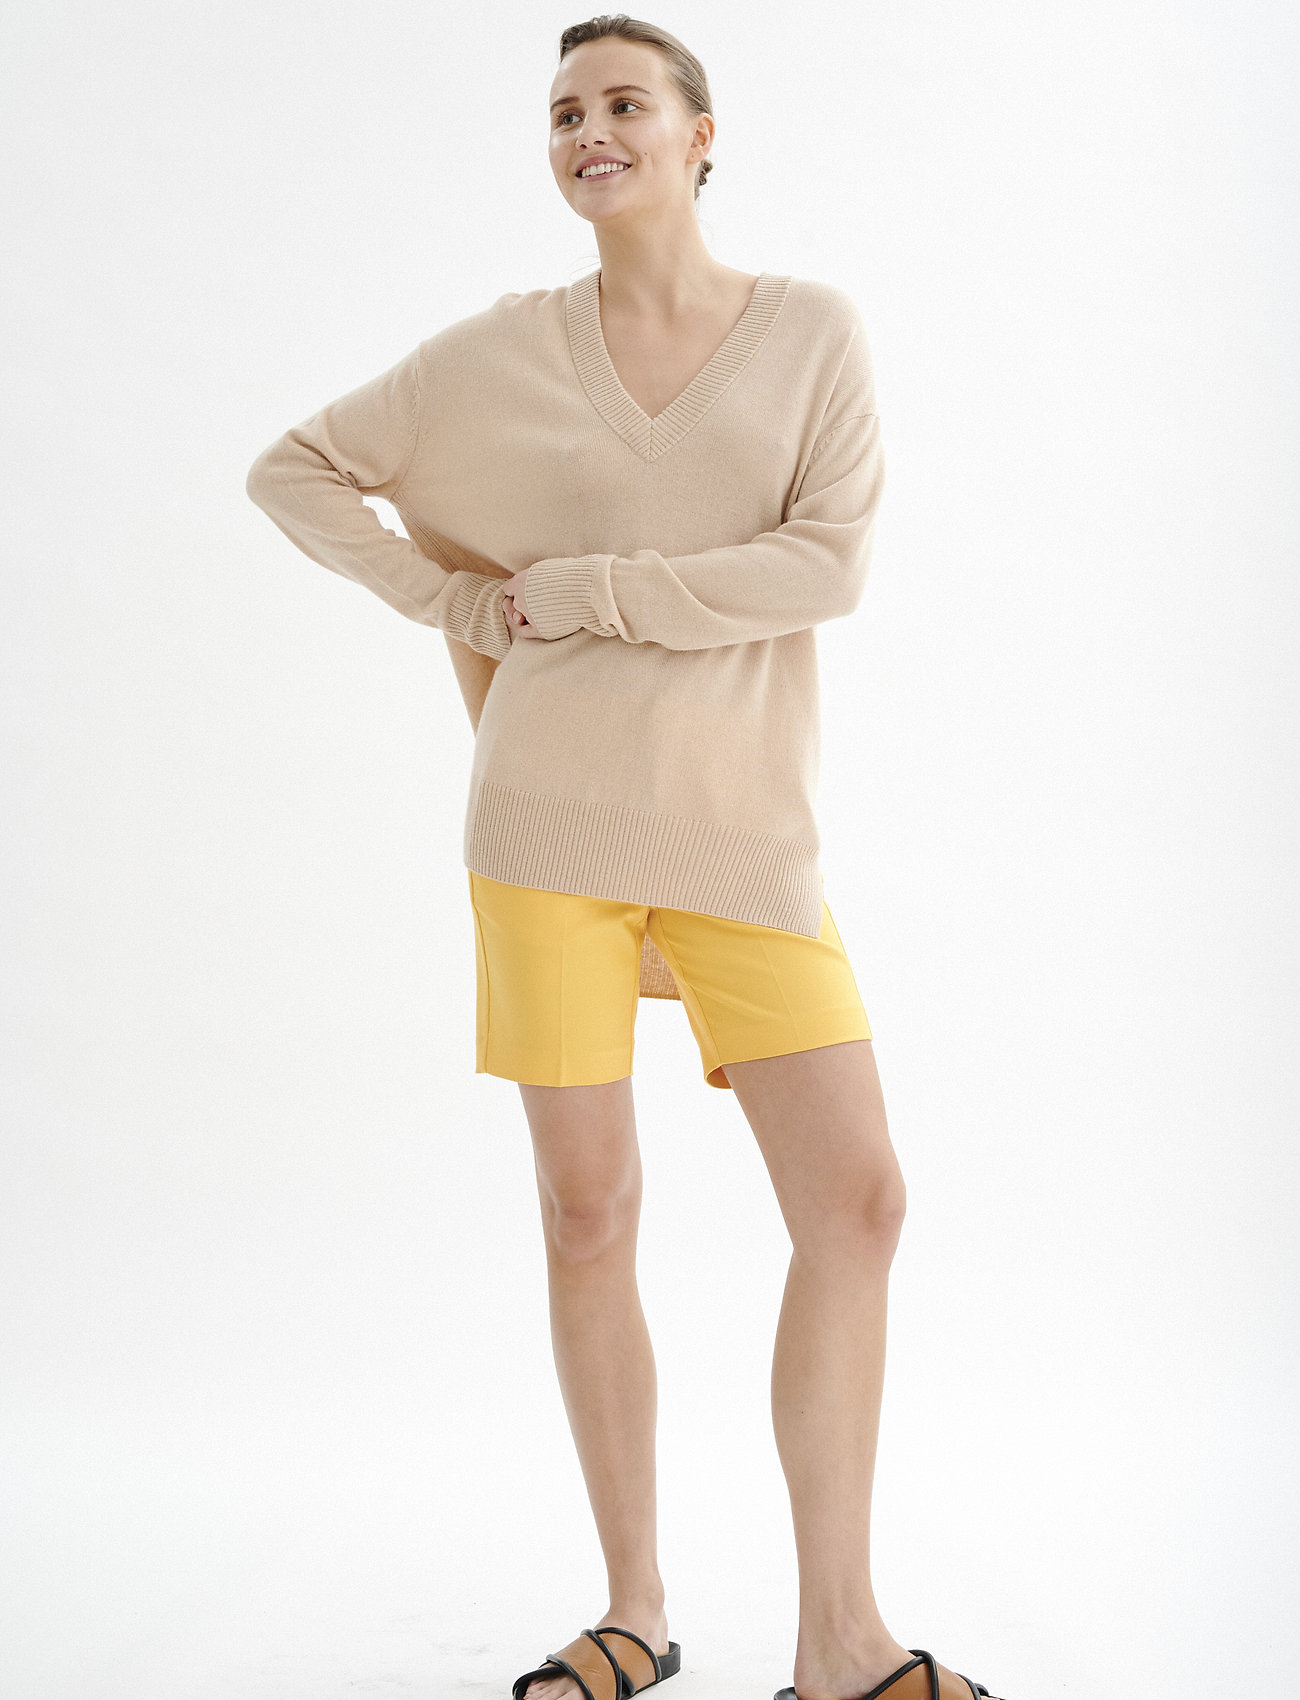 InWear Zella Shorts - Shorts GOLDEN YELLOW - Dameklær Spesialtilbud